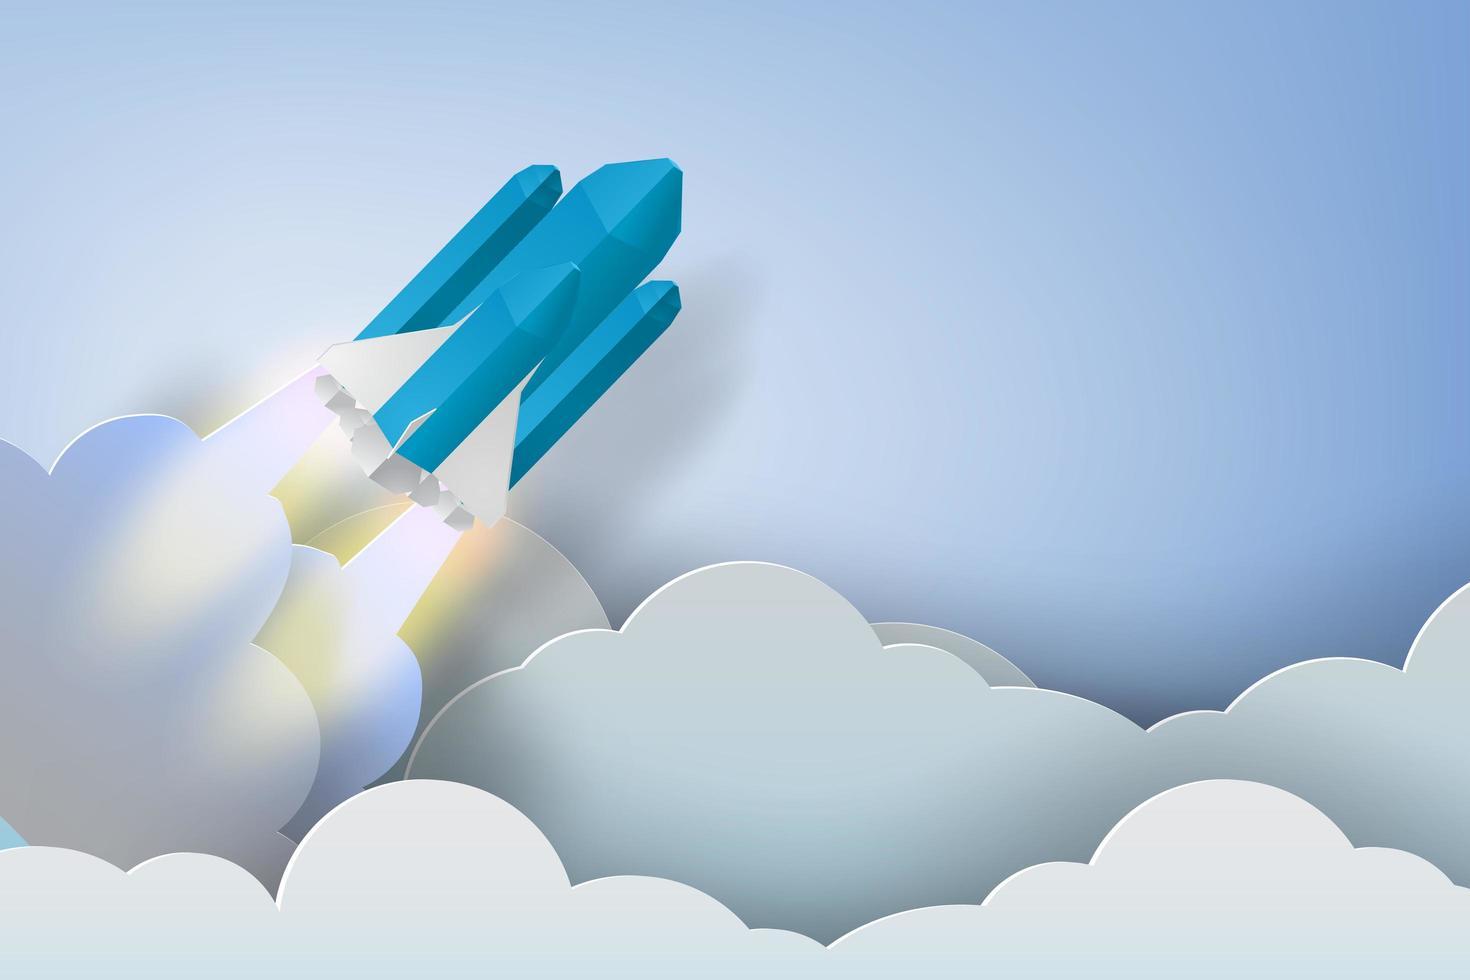 Rocket Flying Through Clouds Paper Art Design  vector